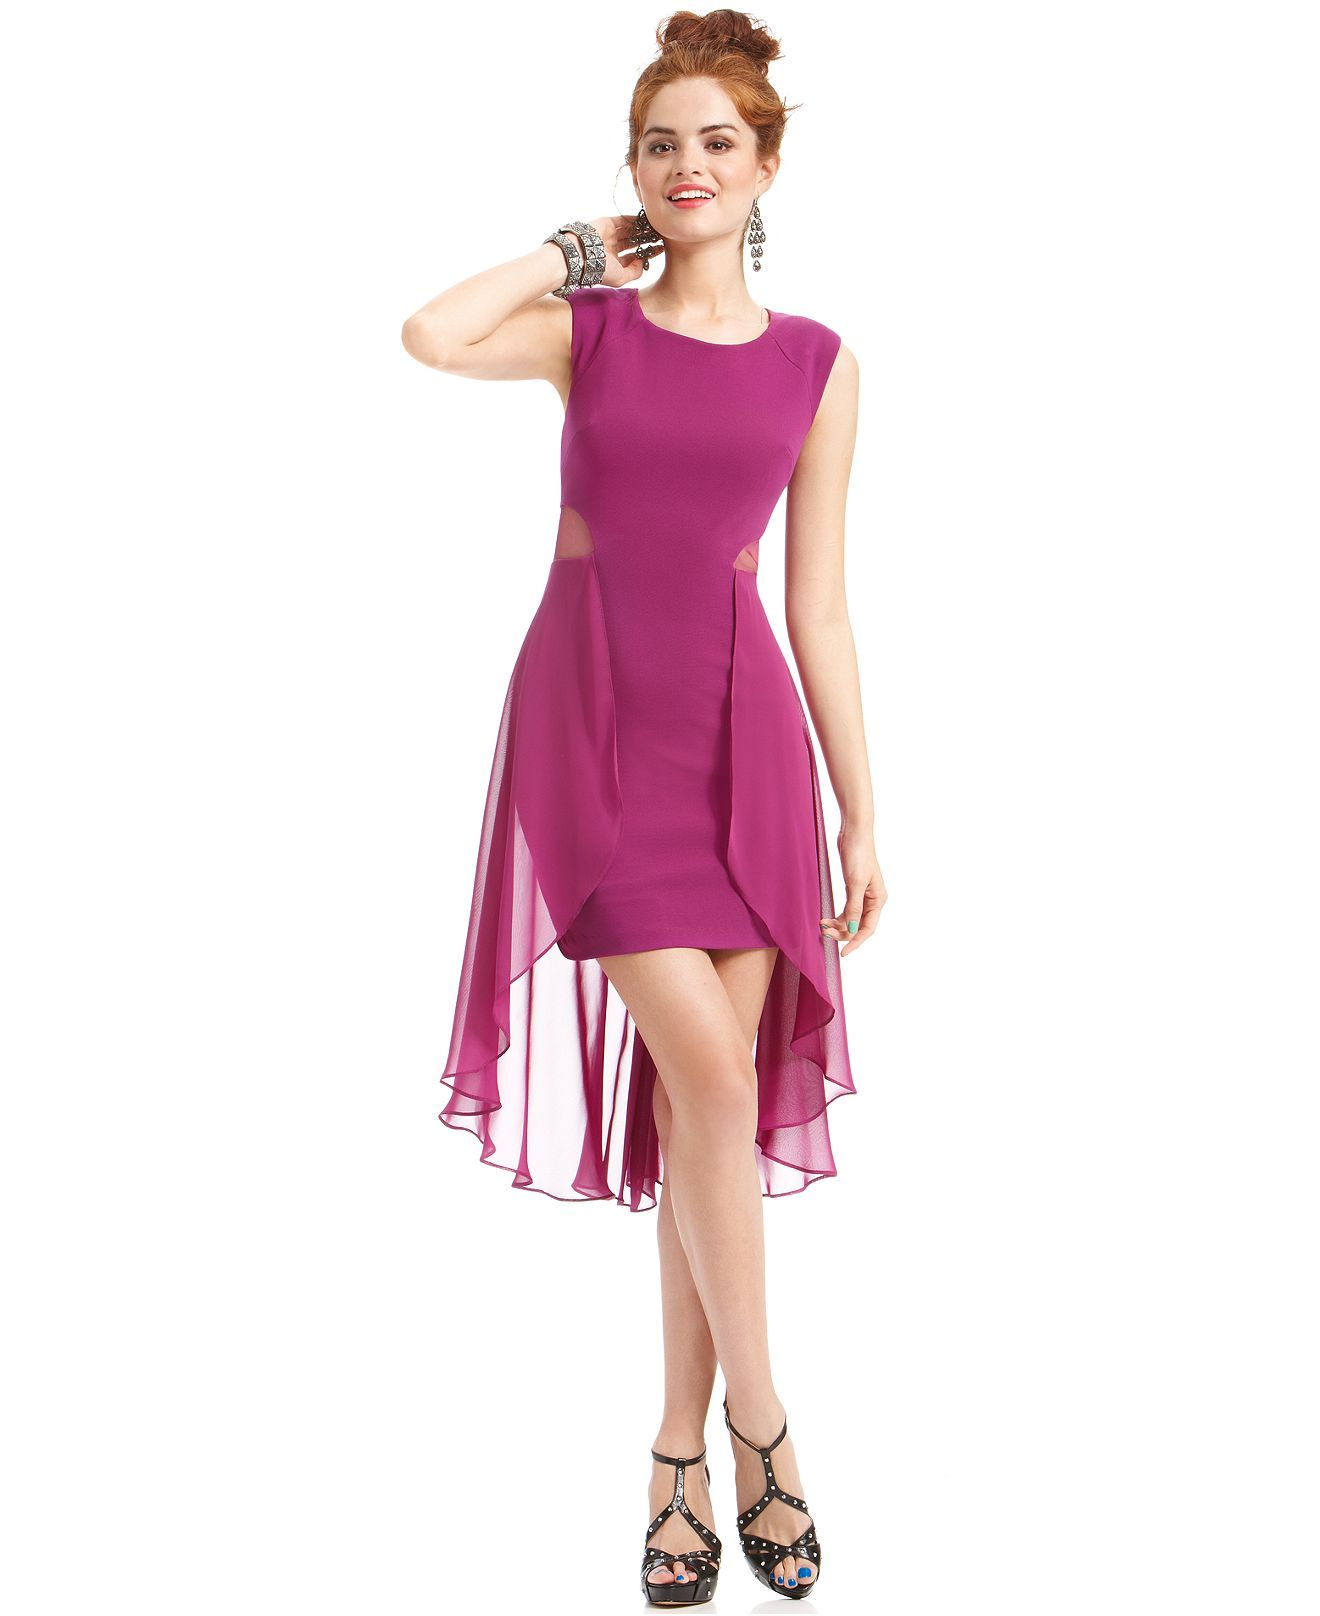 Hailey Logan Juniors Dress Sleeveless Chiffon High-. Find Macy' Dresses